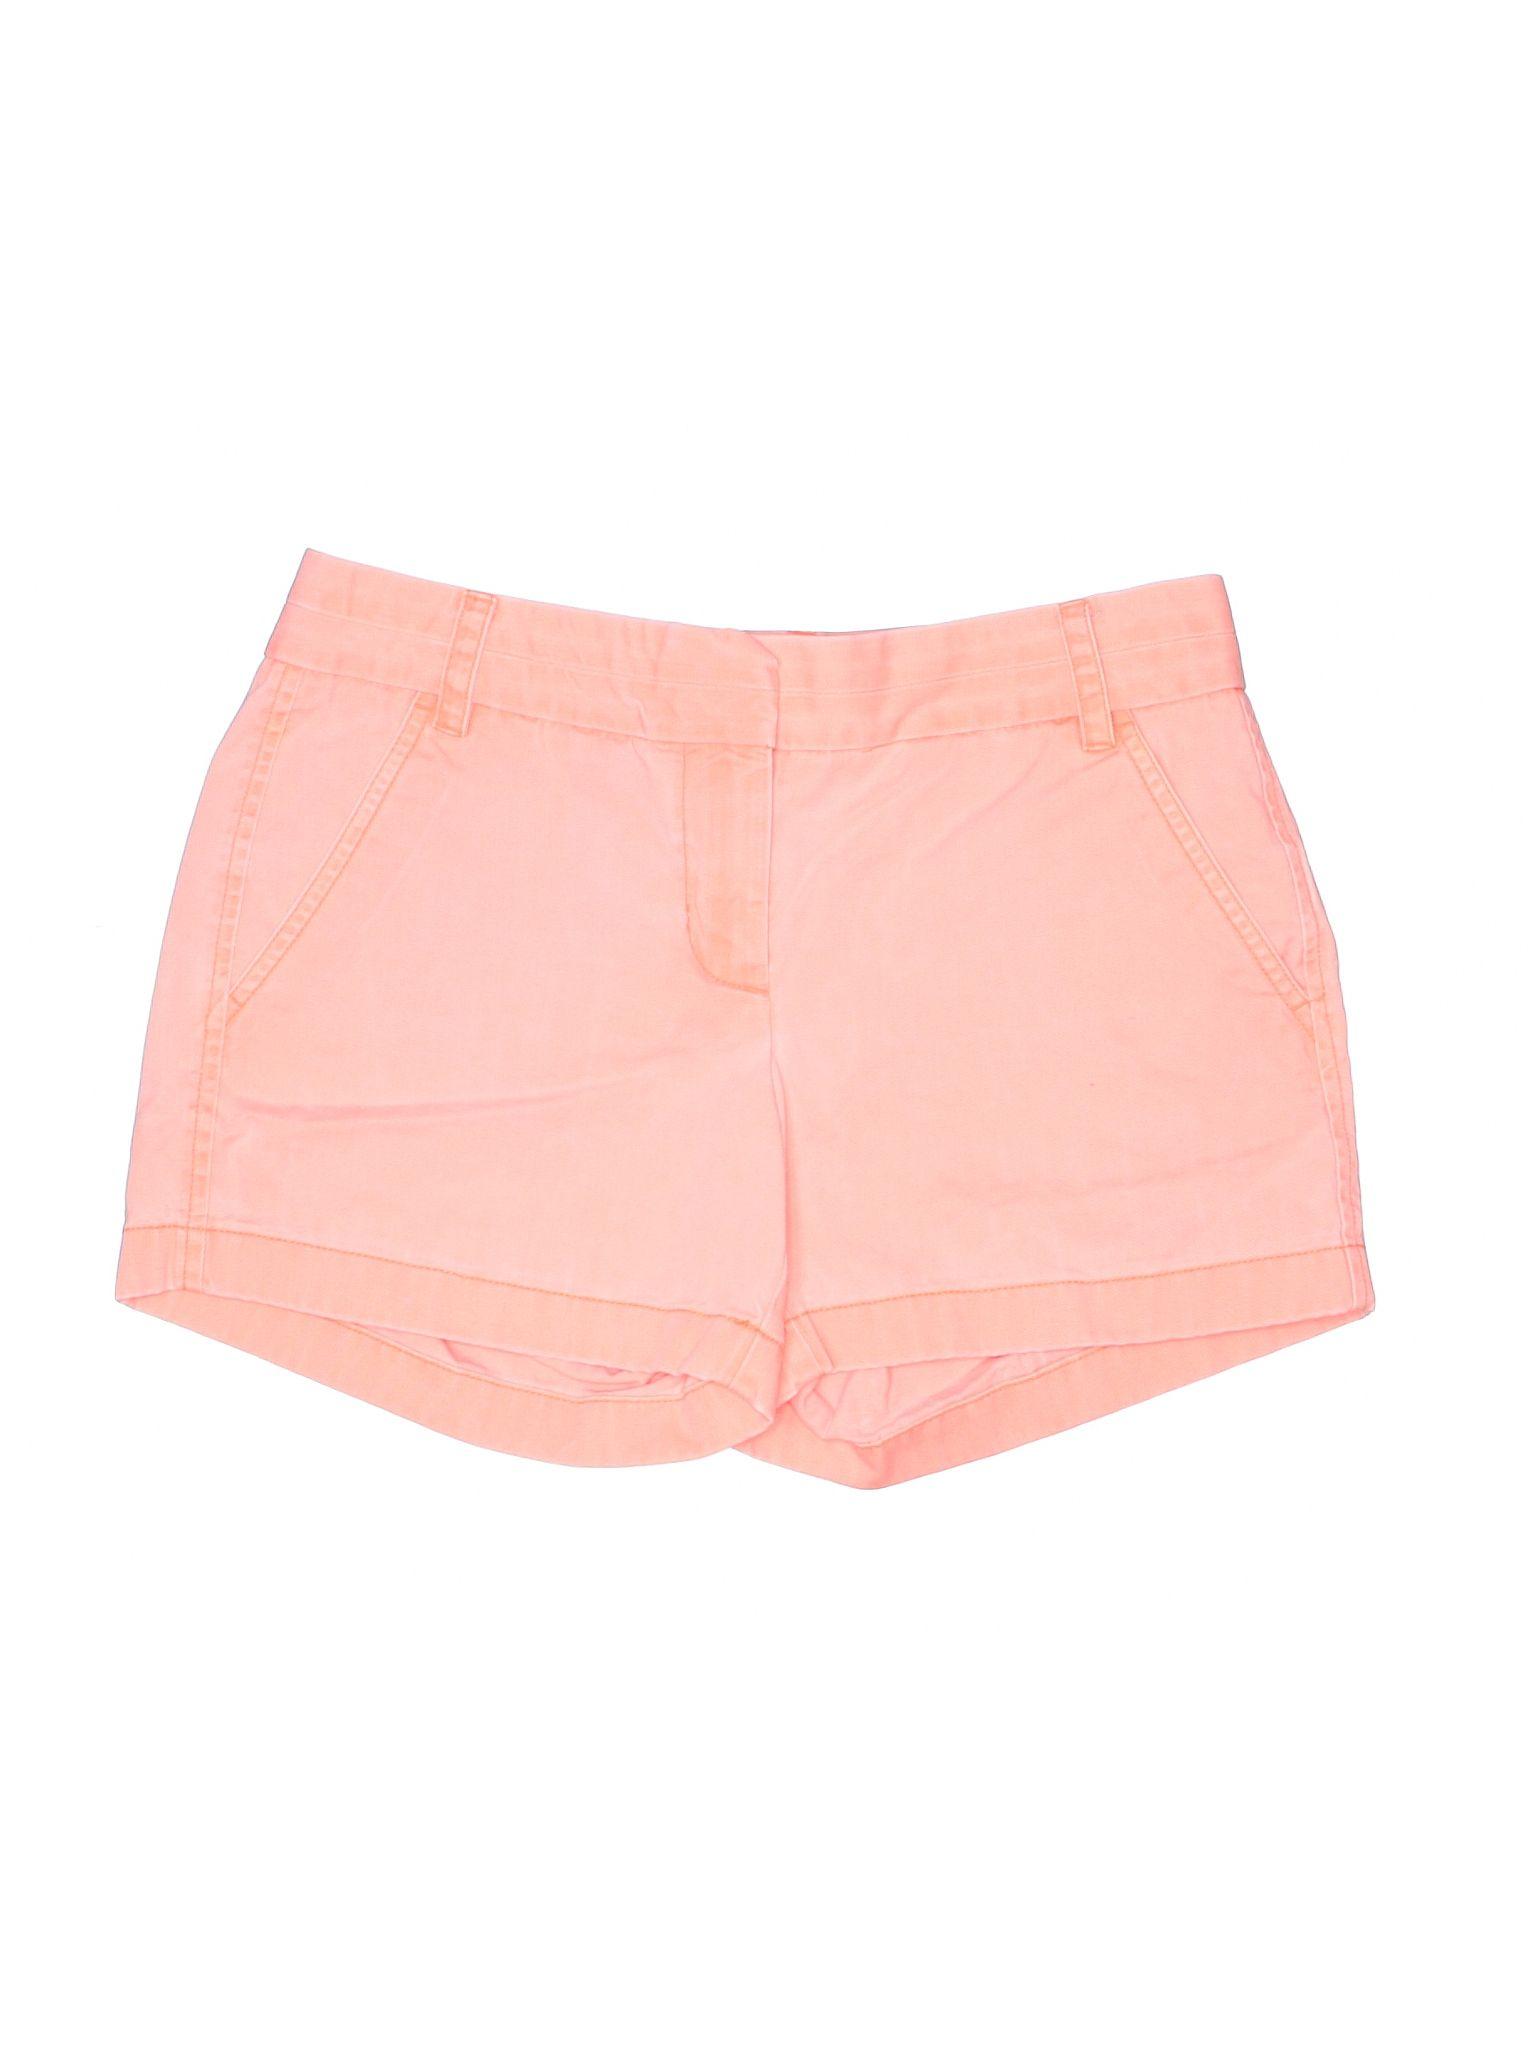 J Crew Khaki Shorts Size 200 Coral Womens Bottoms